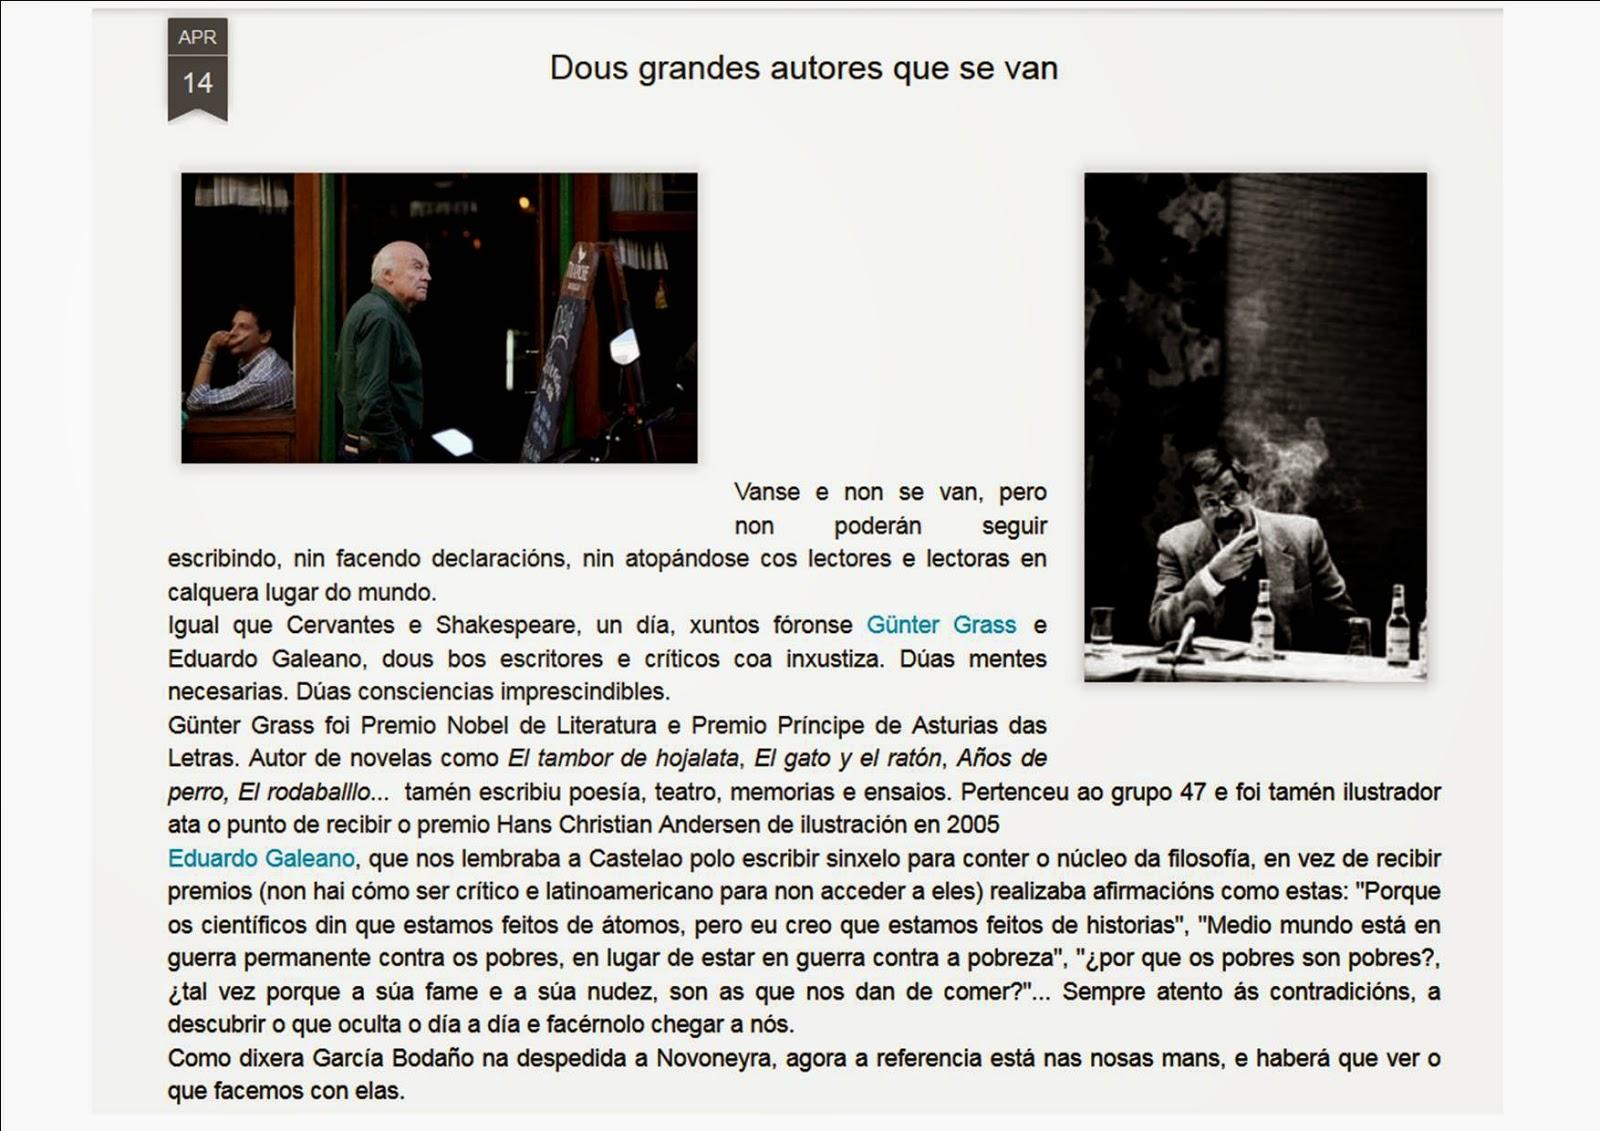 http://redelectura.blogspot.com.es/2015/04/dous-grandes-autores-que-se-van.html